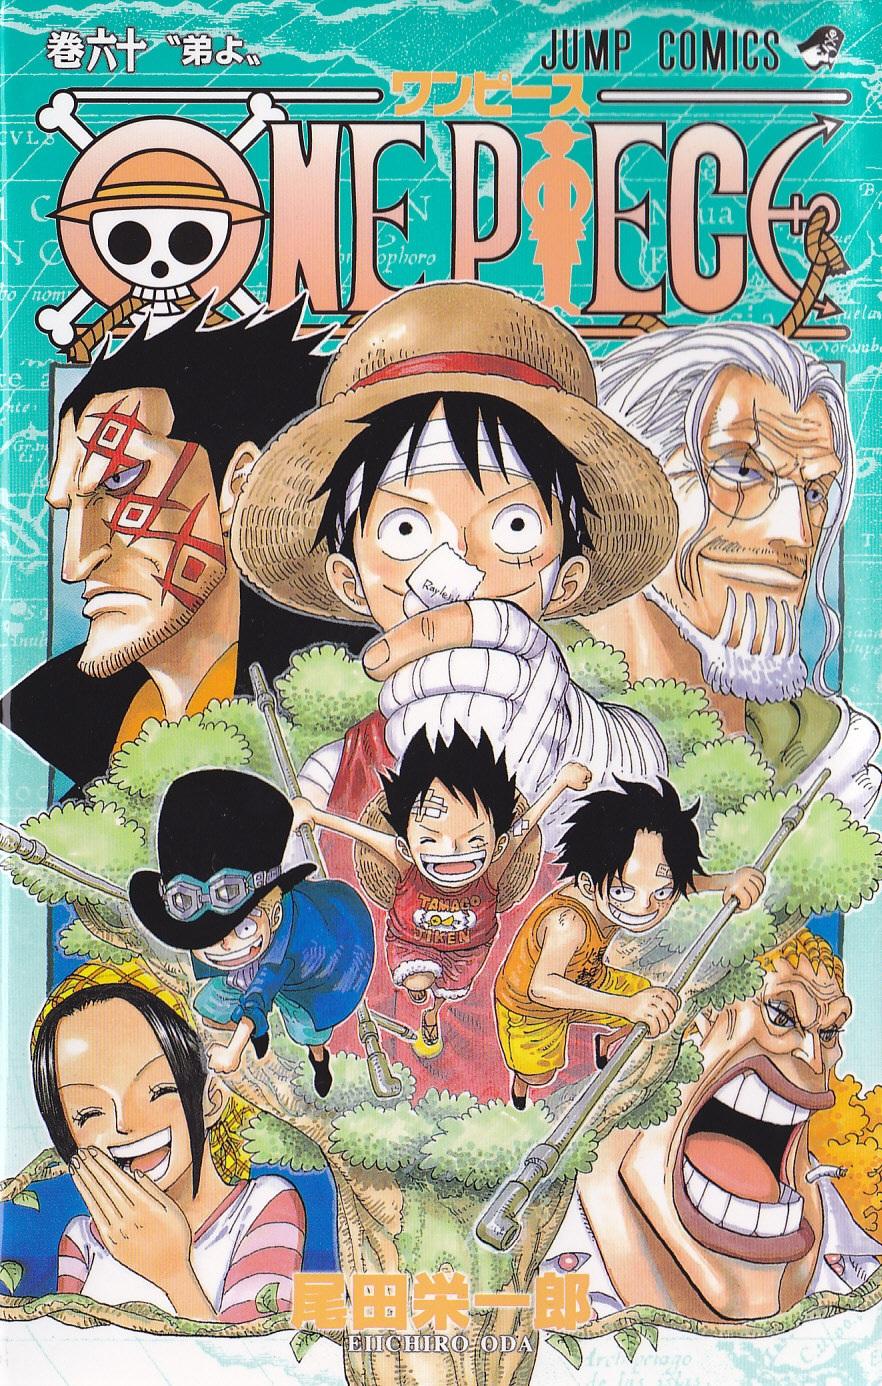 ONE PIECE Vol.94 Anime Manga Comics Jump Luffy Japanese Edition From Japan